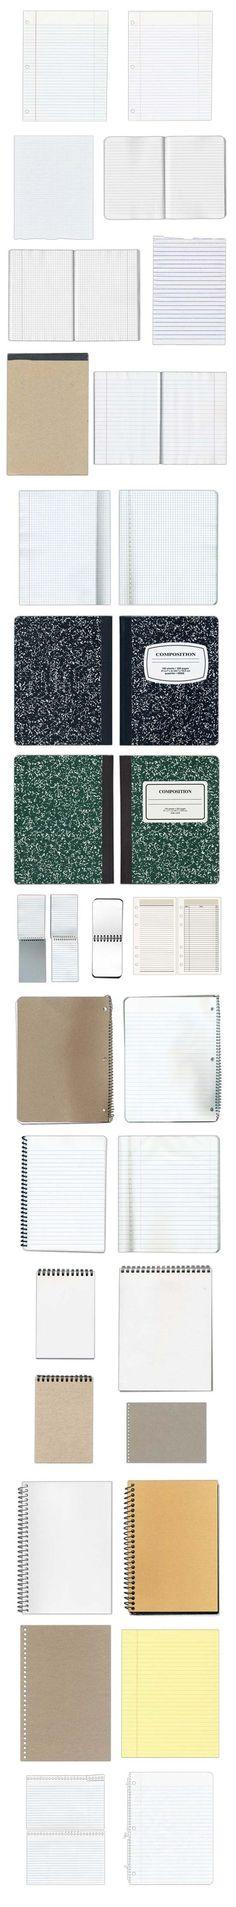 lots of free notepad and notebook textures / papiers à carreaux divers gratuits